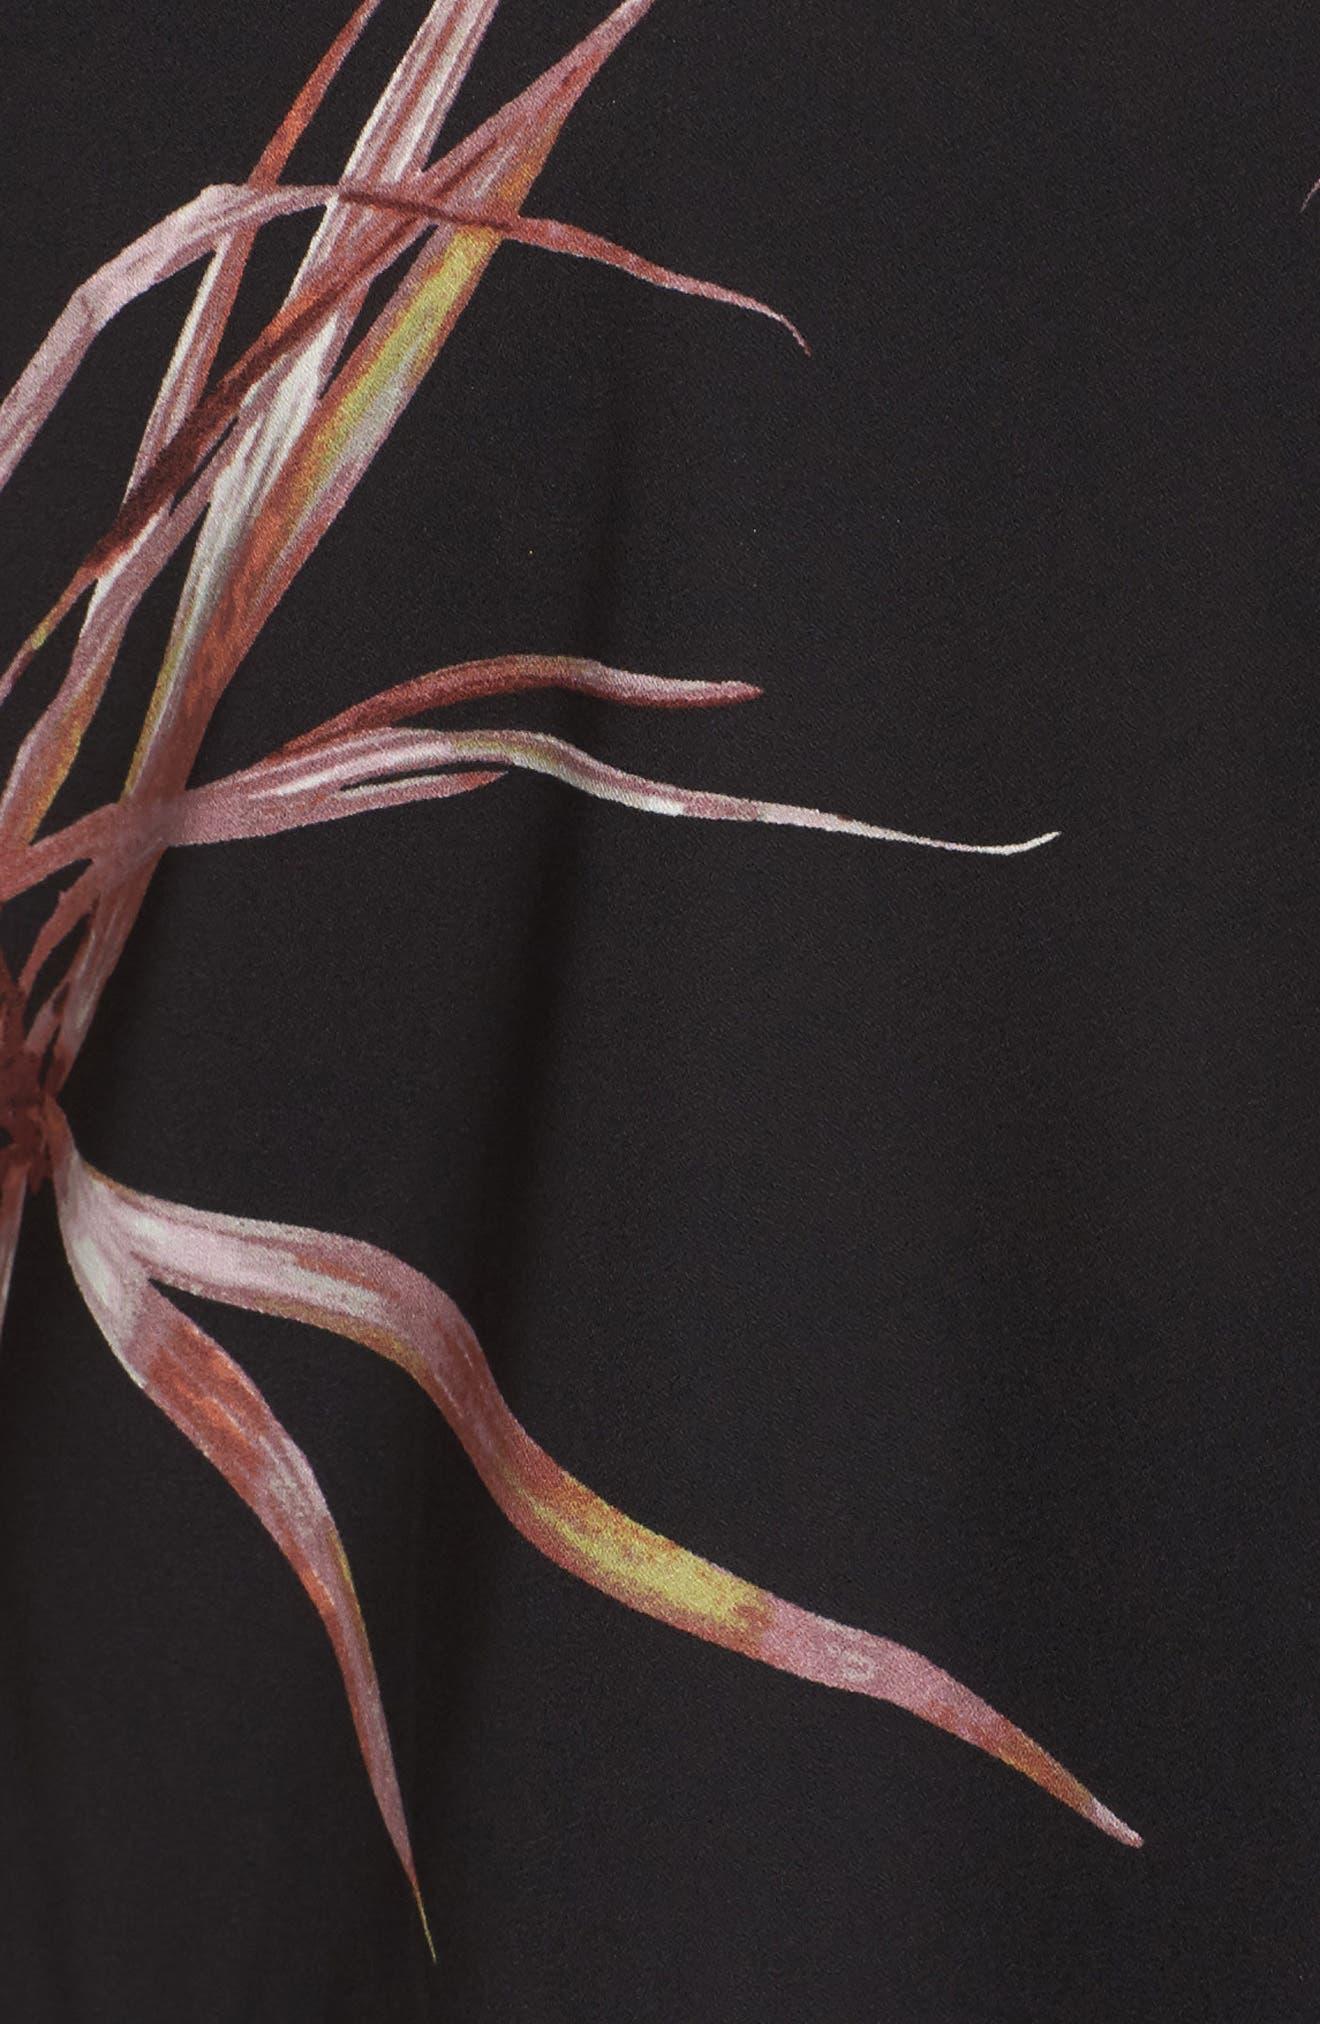 Lattice Tie Top,                             Alternate thumbnail 5, color,                             005